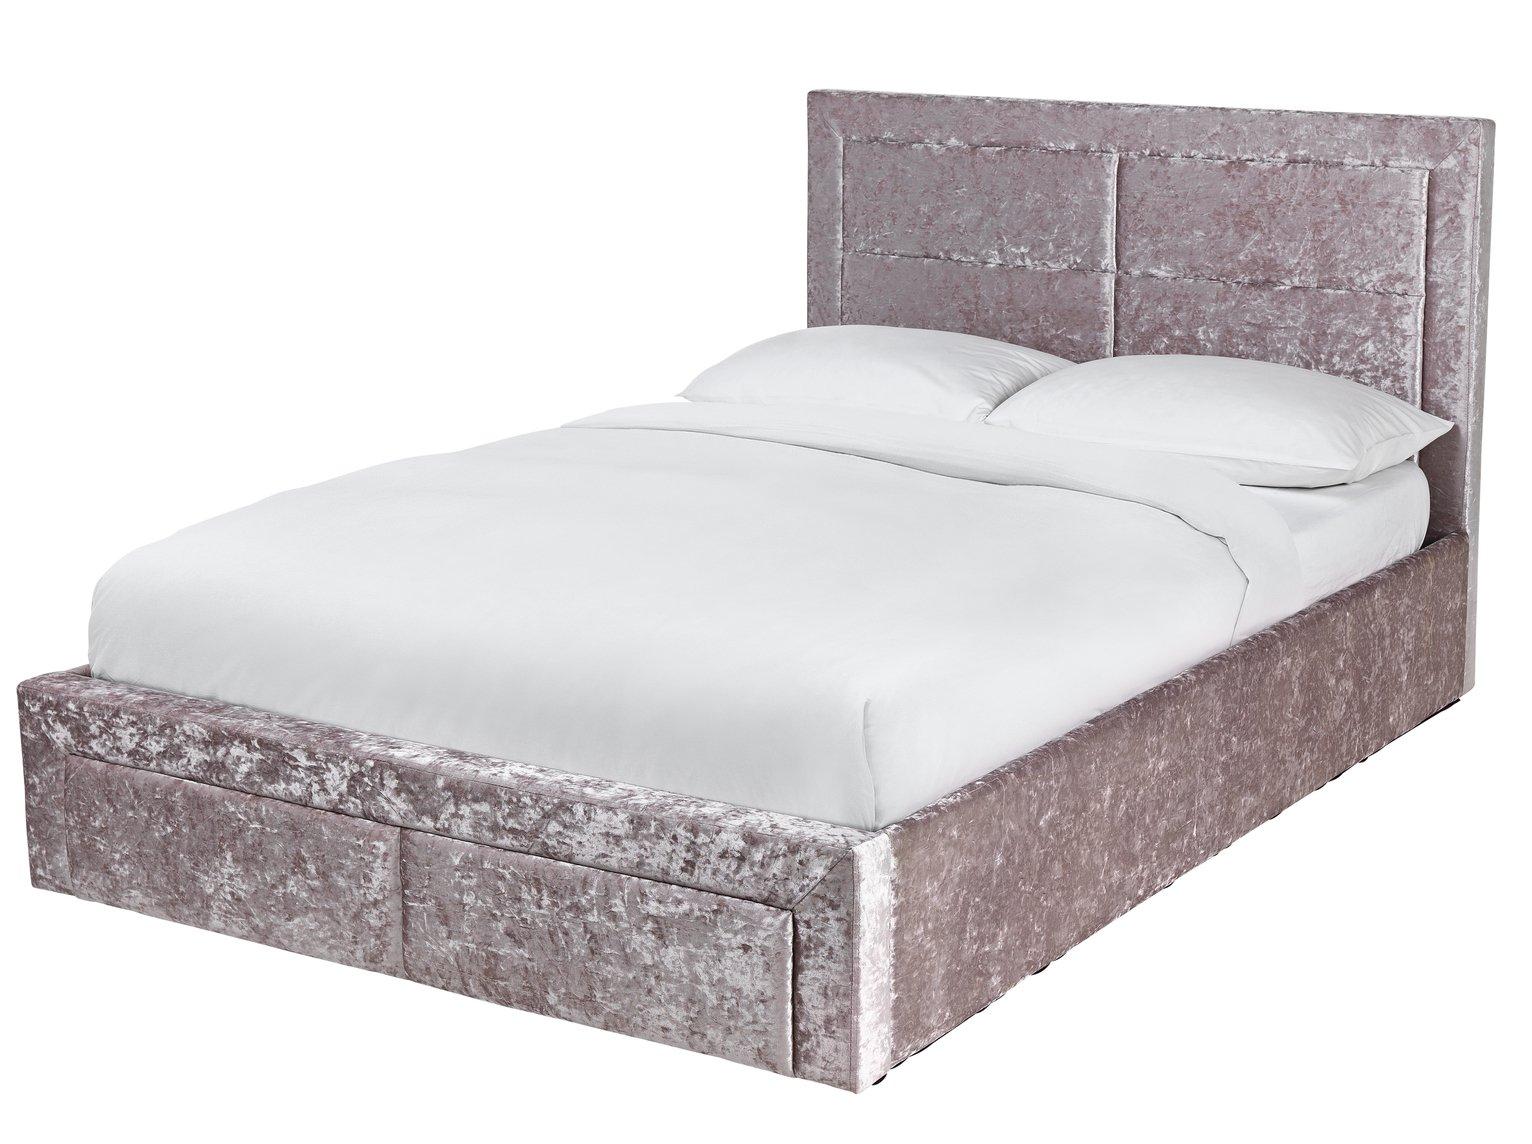 Argos Home Kourtney Velvet End Open Ottoman Dbl Bed - Silver